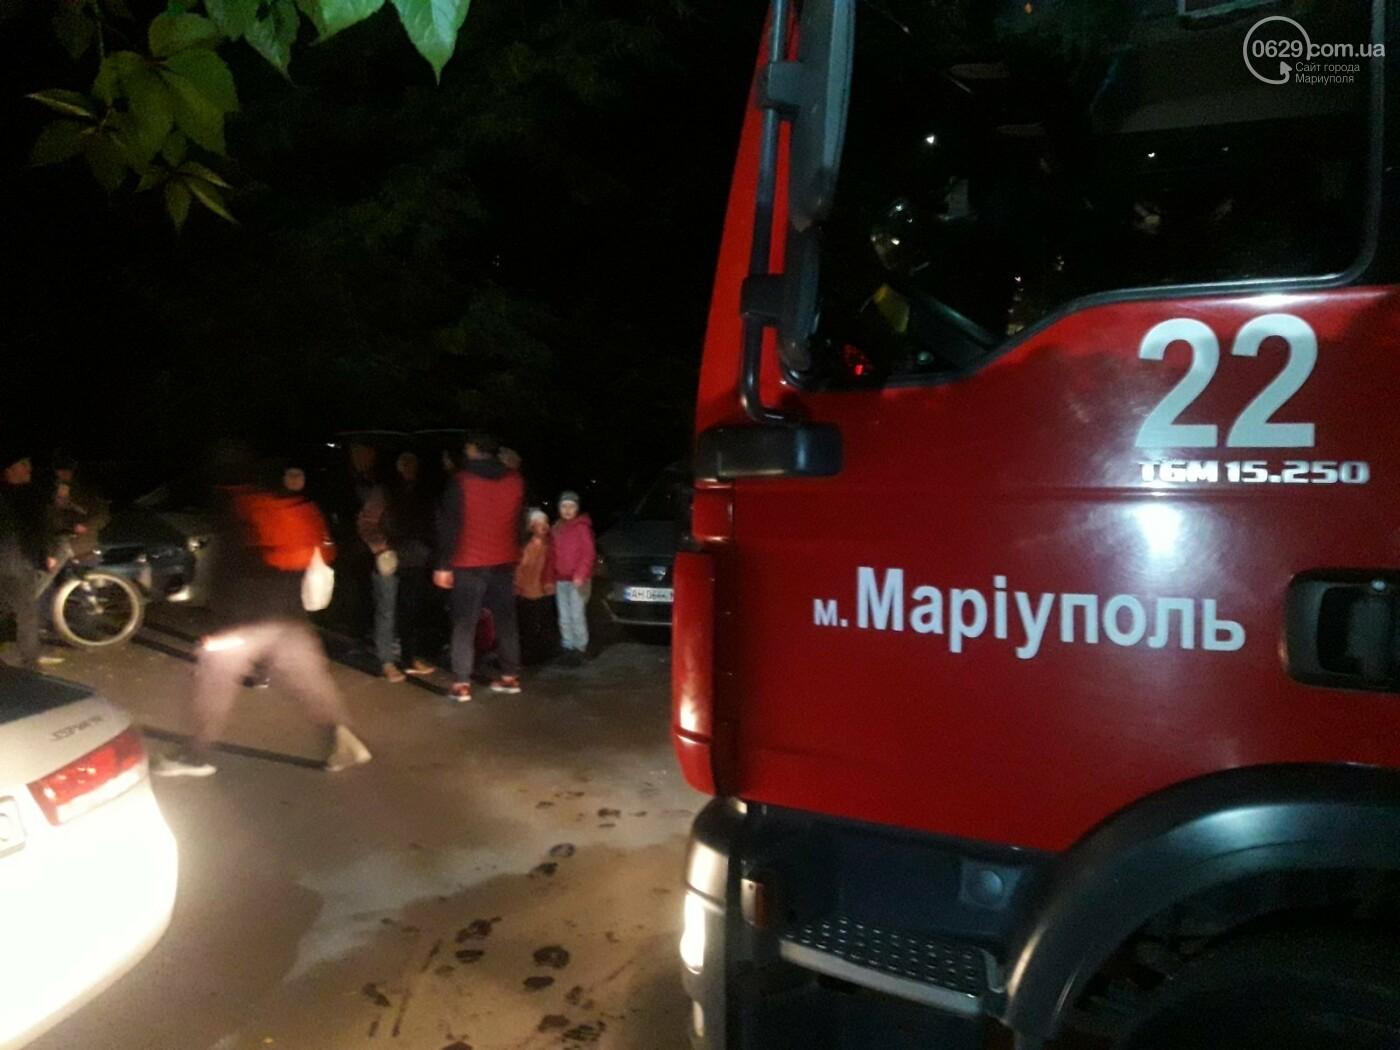 В Мариуполе при пожаре  в девятиэтажке пострадал мужчина, - ФОТО, фото-2